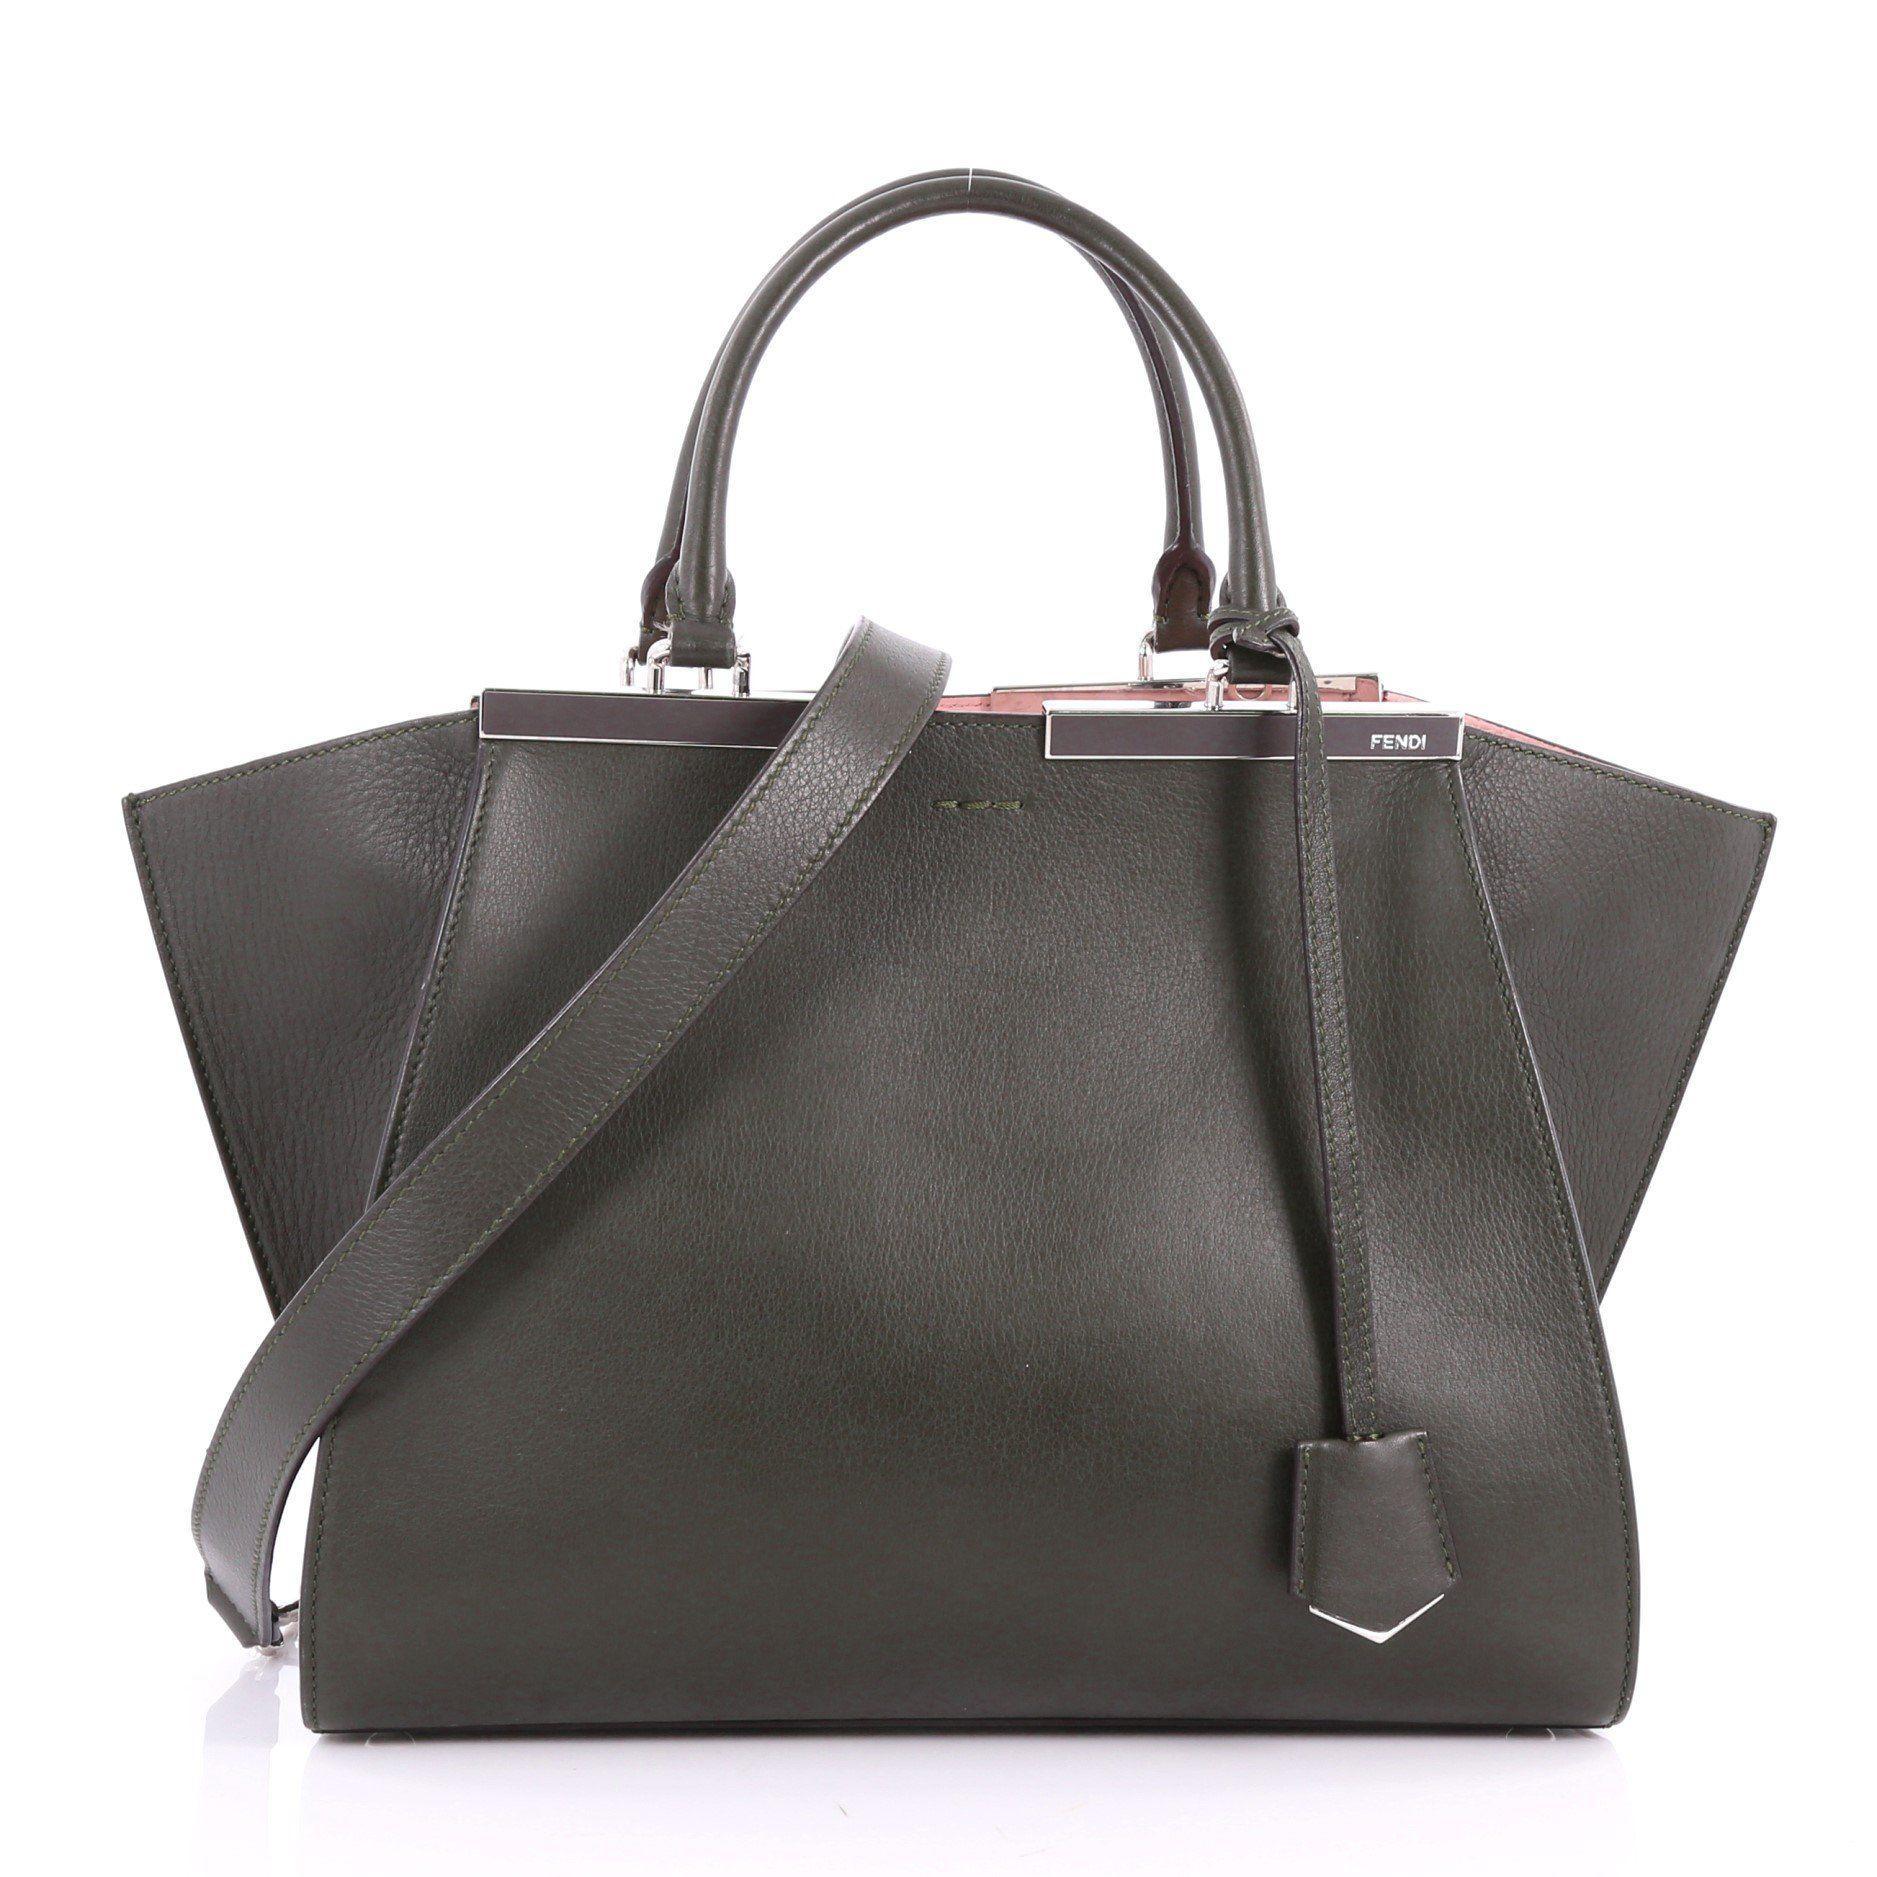 768a0653e78a Fendi - Black Petite 3jours Handbag Leather - Lyst. View fullscreen